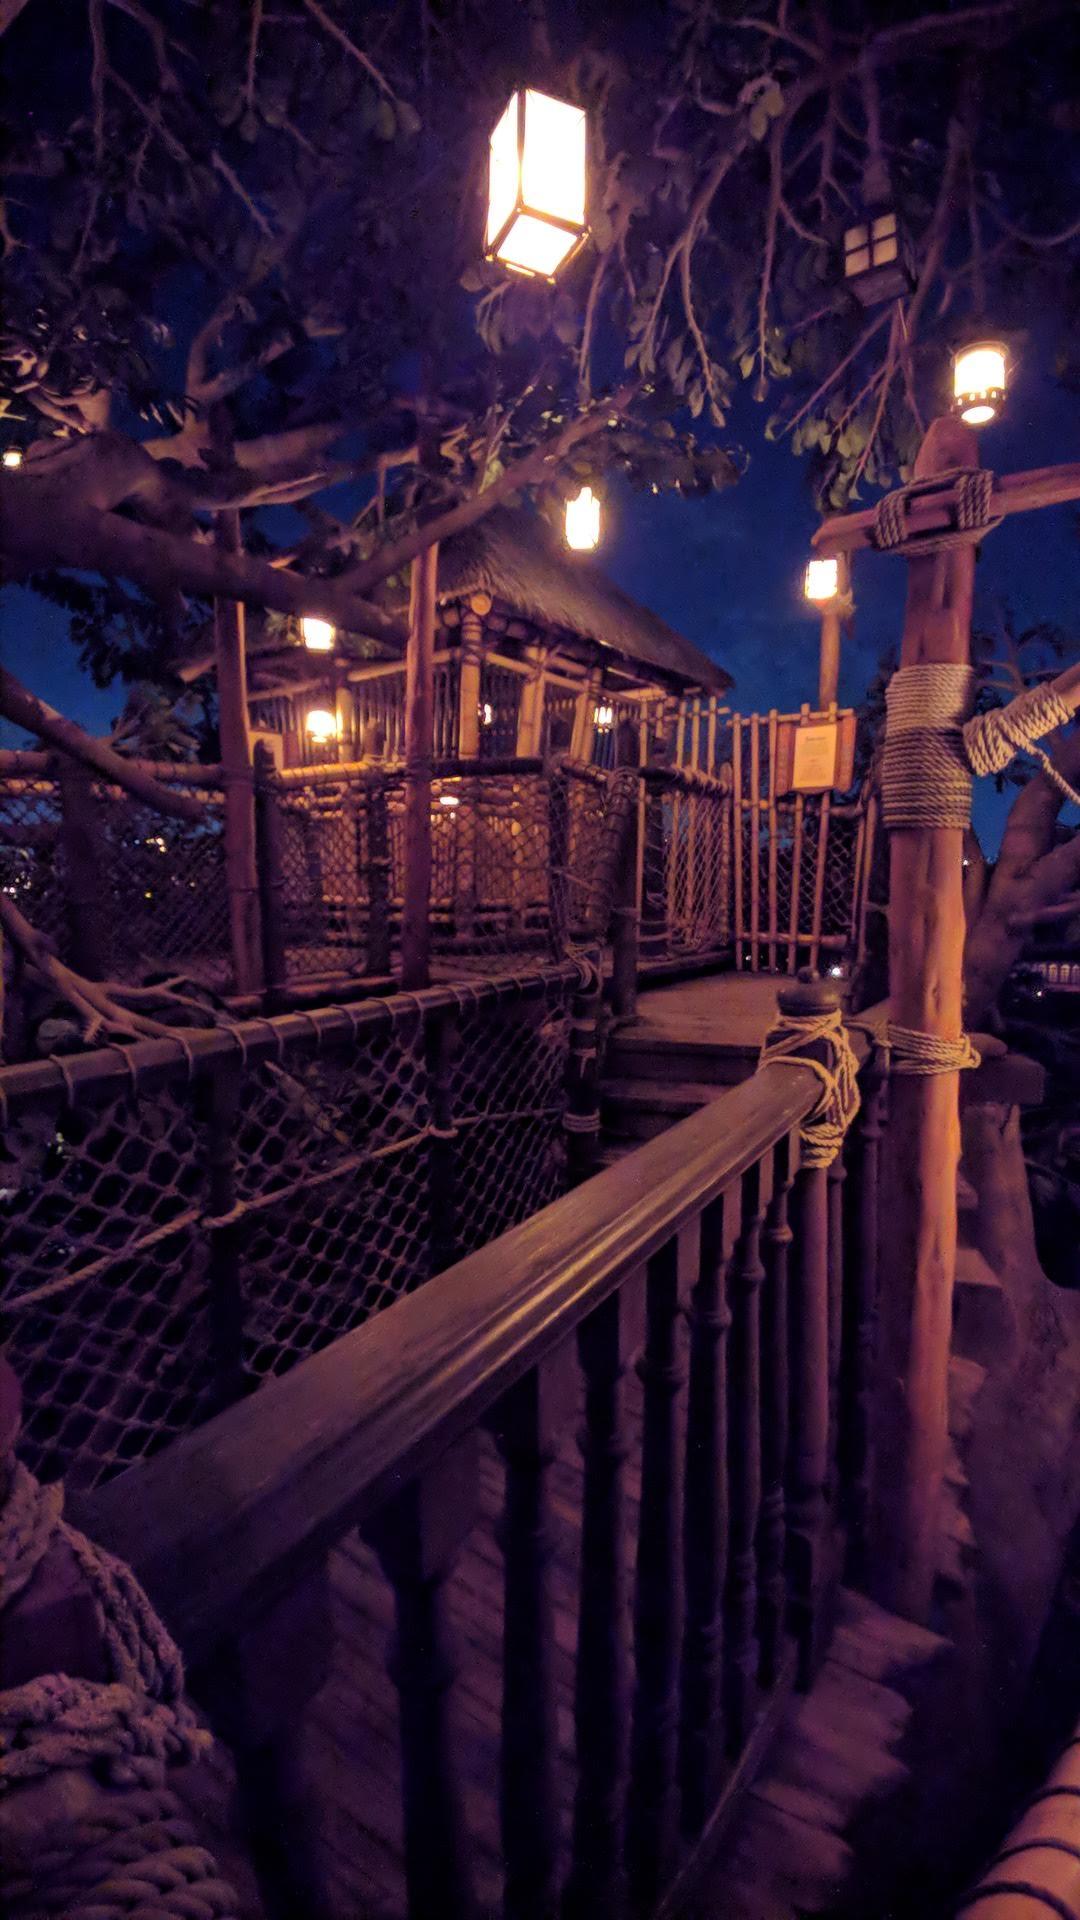 Swiss Family Treehouse - The Enchanted Tiki Room - Tokyo Disneyland